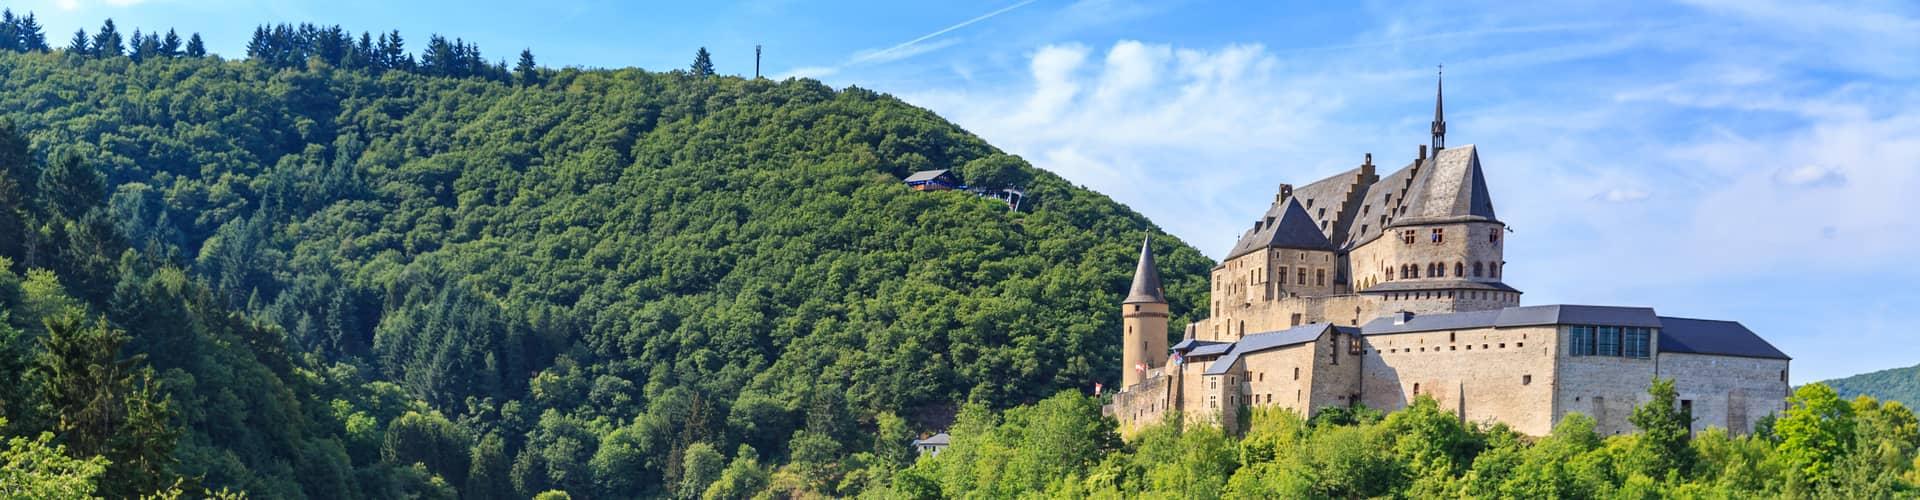 Kamperen in Diekirch